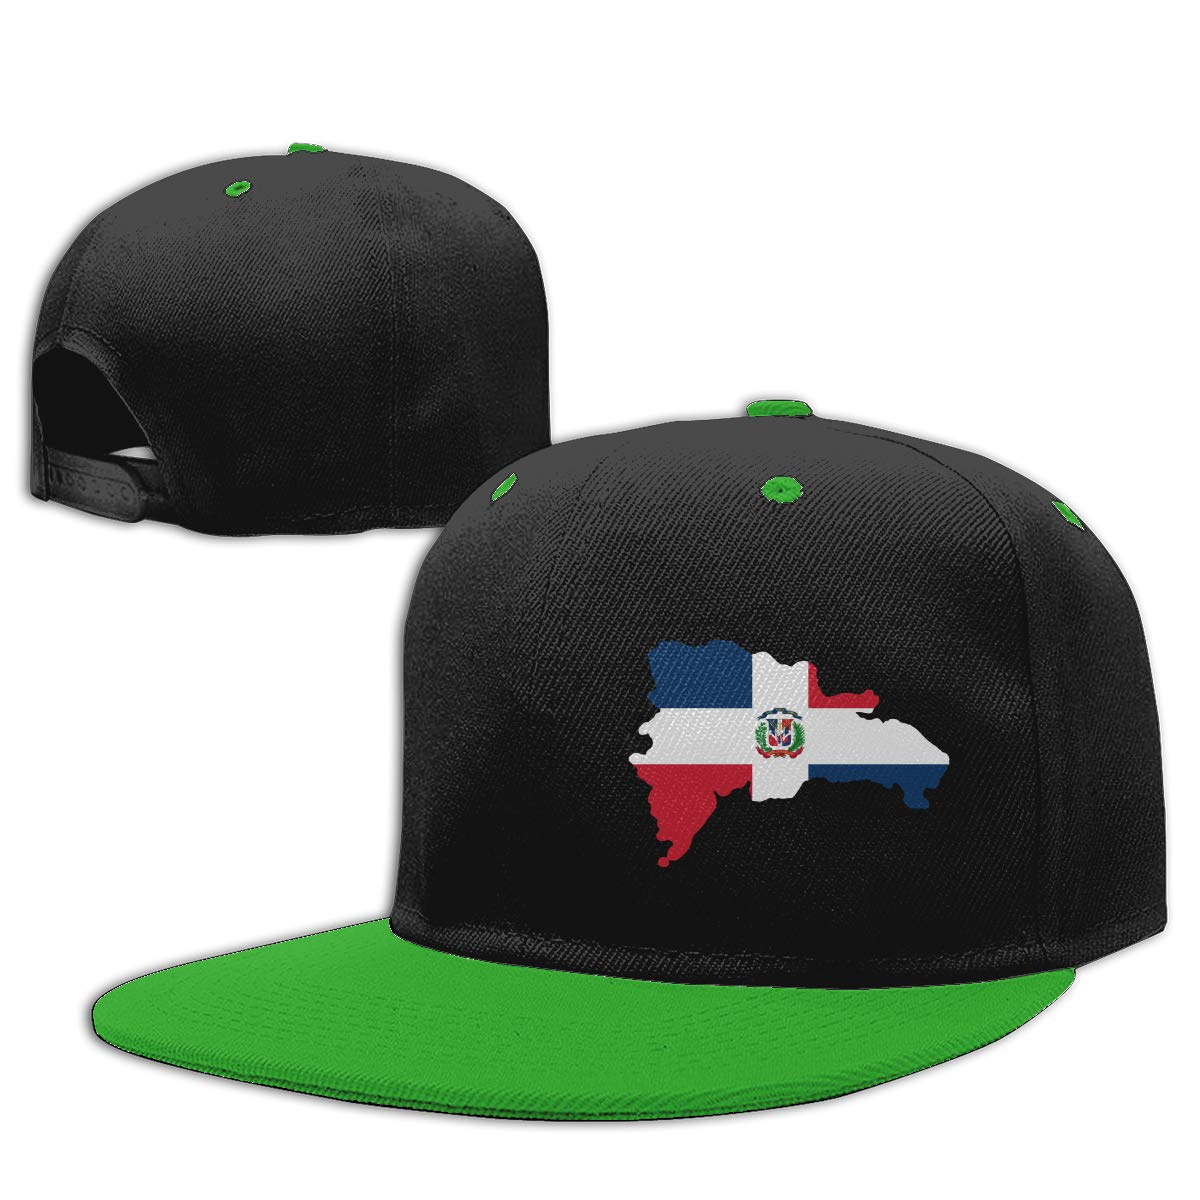 NMG-01 Women Men Hiphop Cap Dominican Republic Adults Flat Bill Baseball Caps